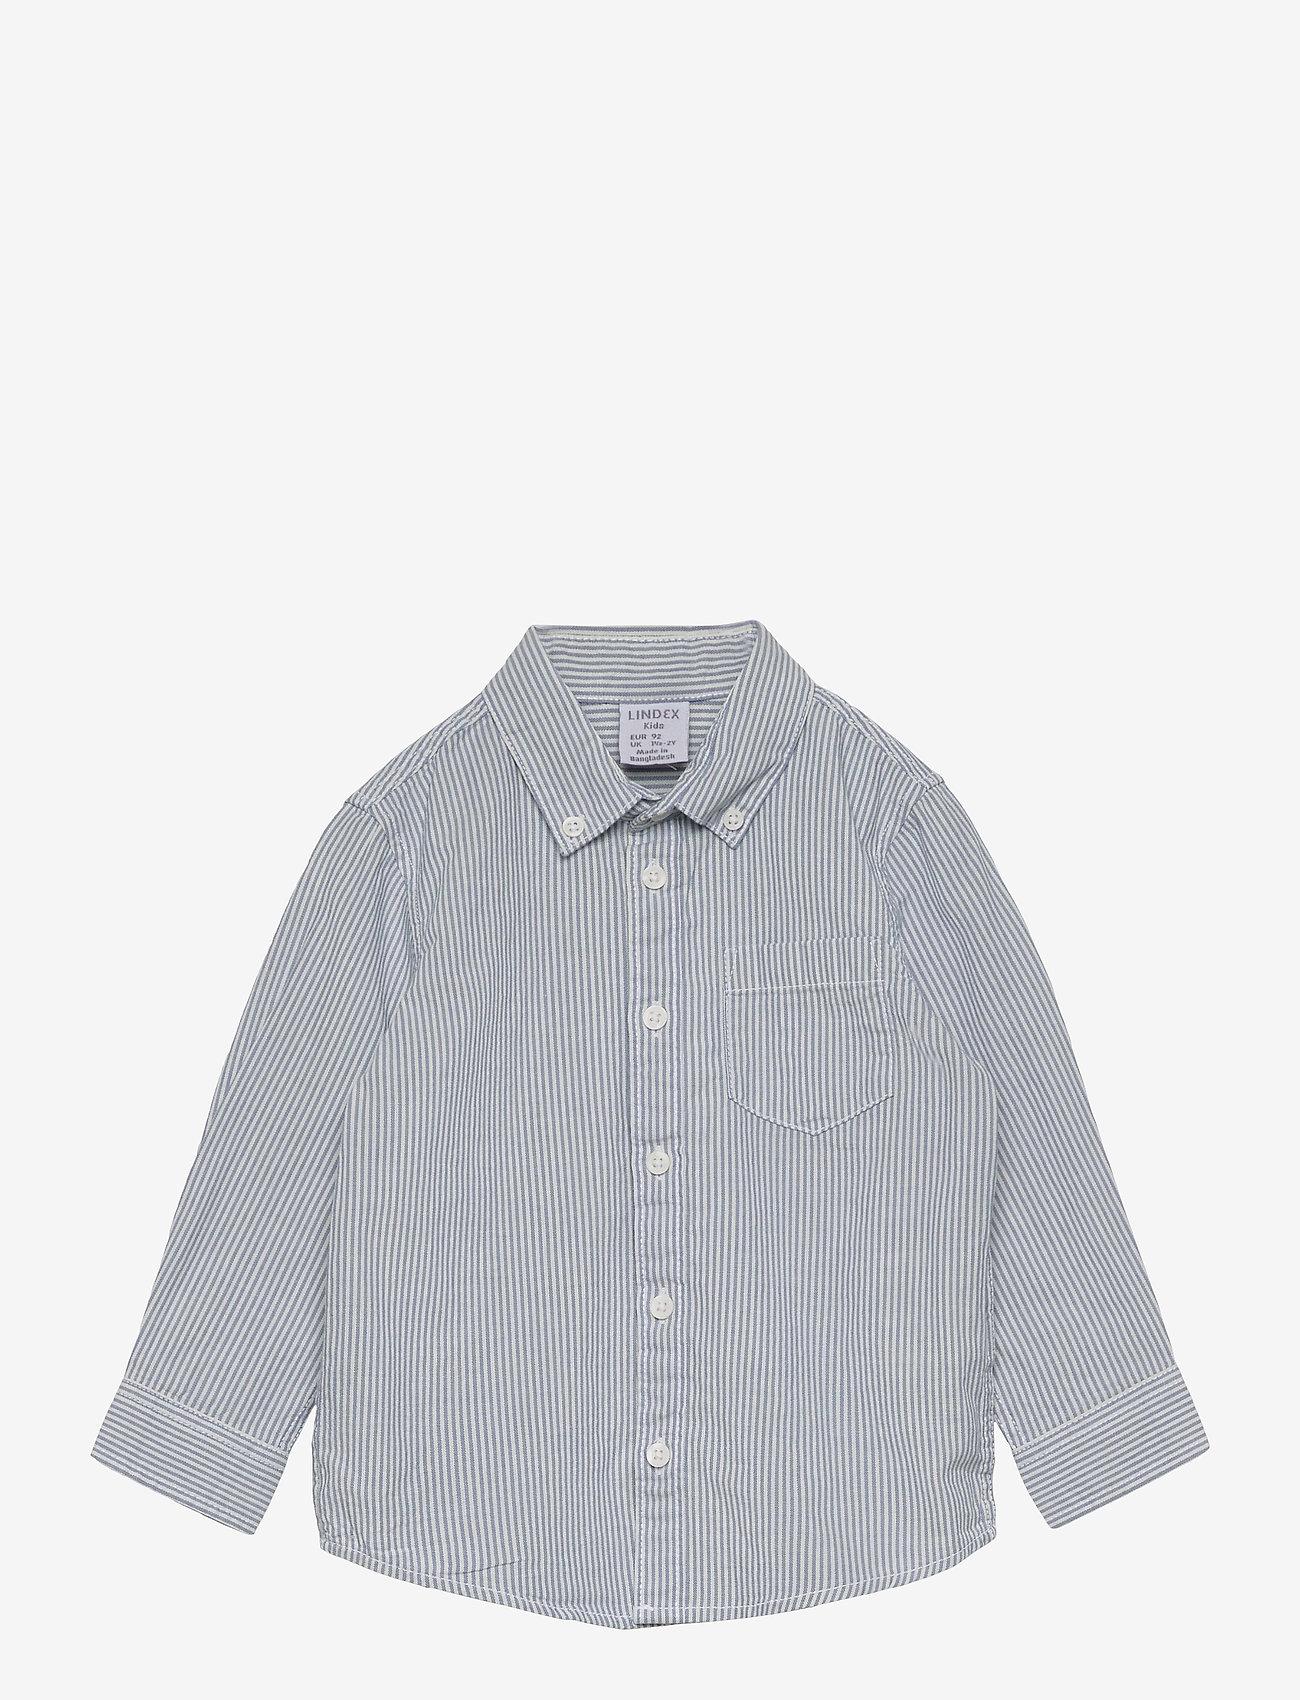 Lindex - Shirt Blue stripe - shirts - white - 0